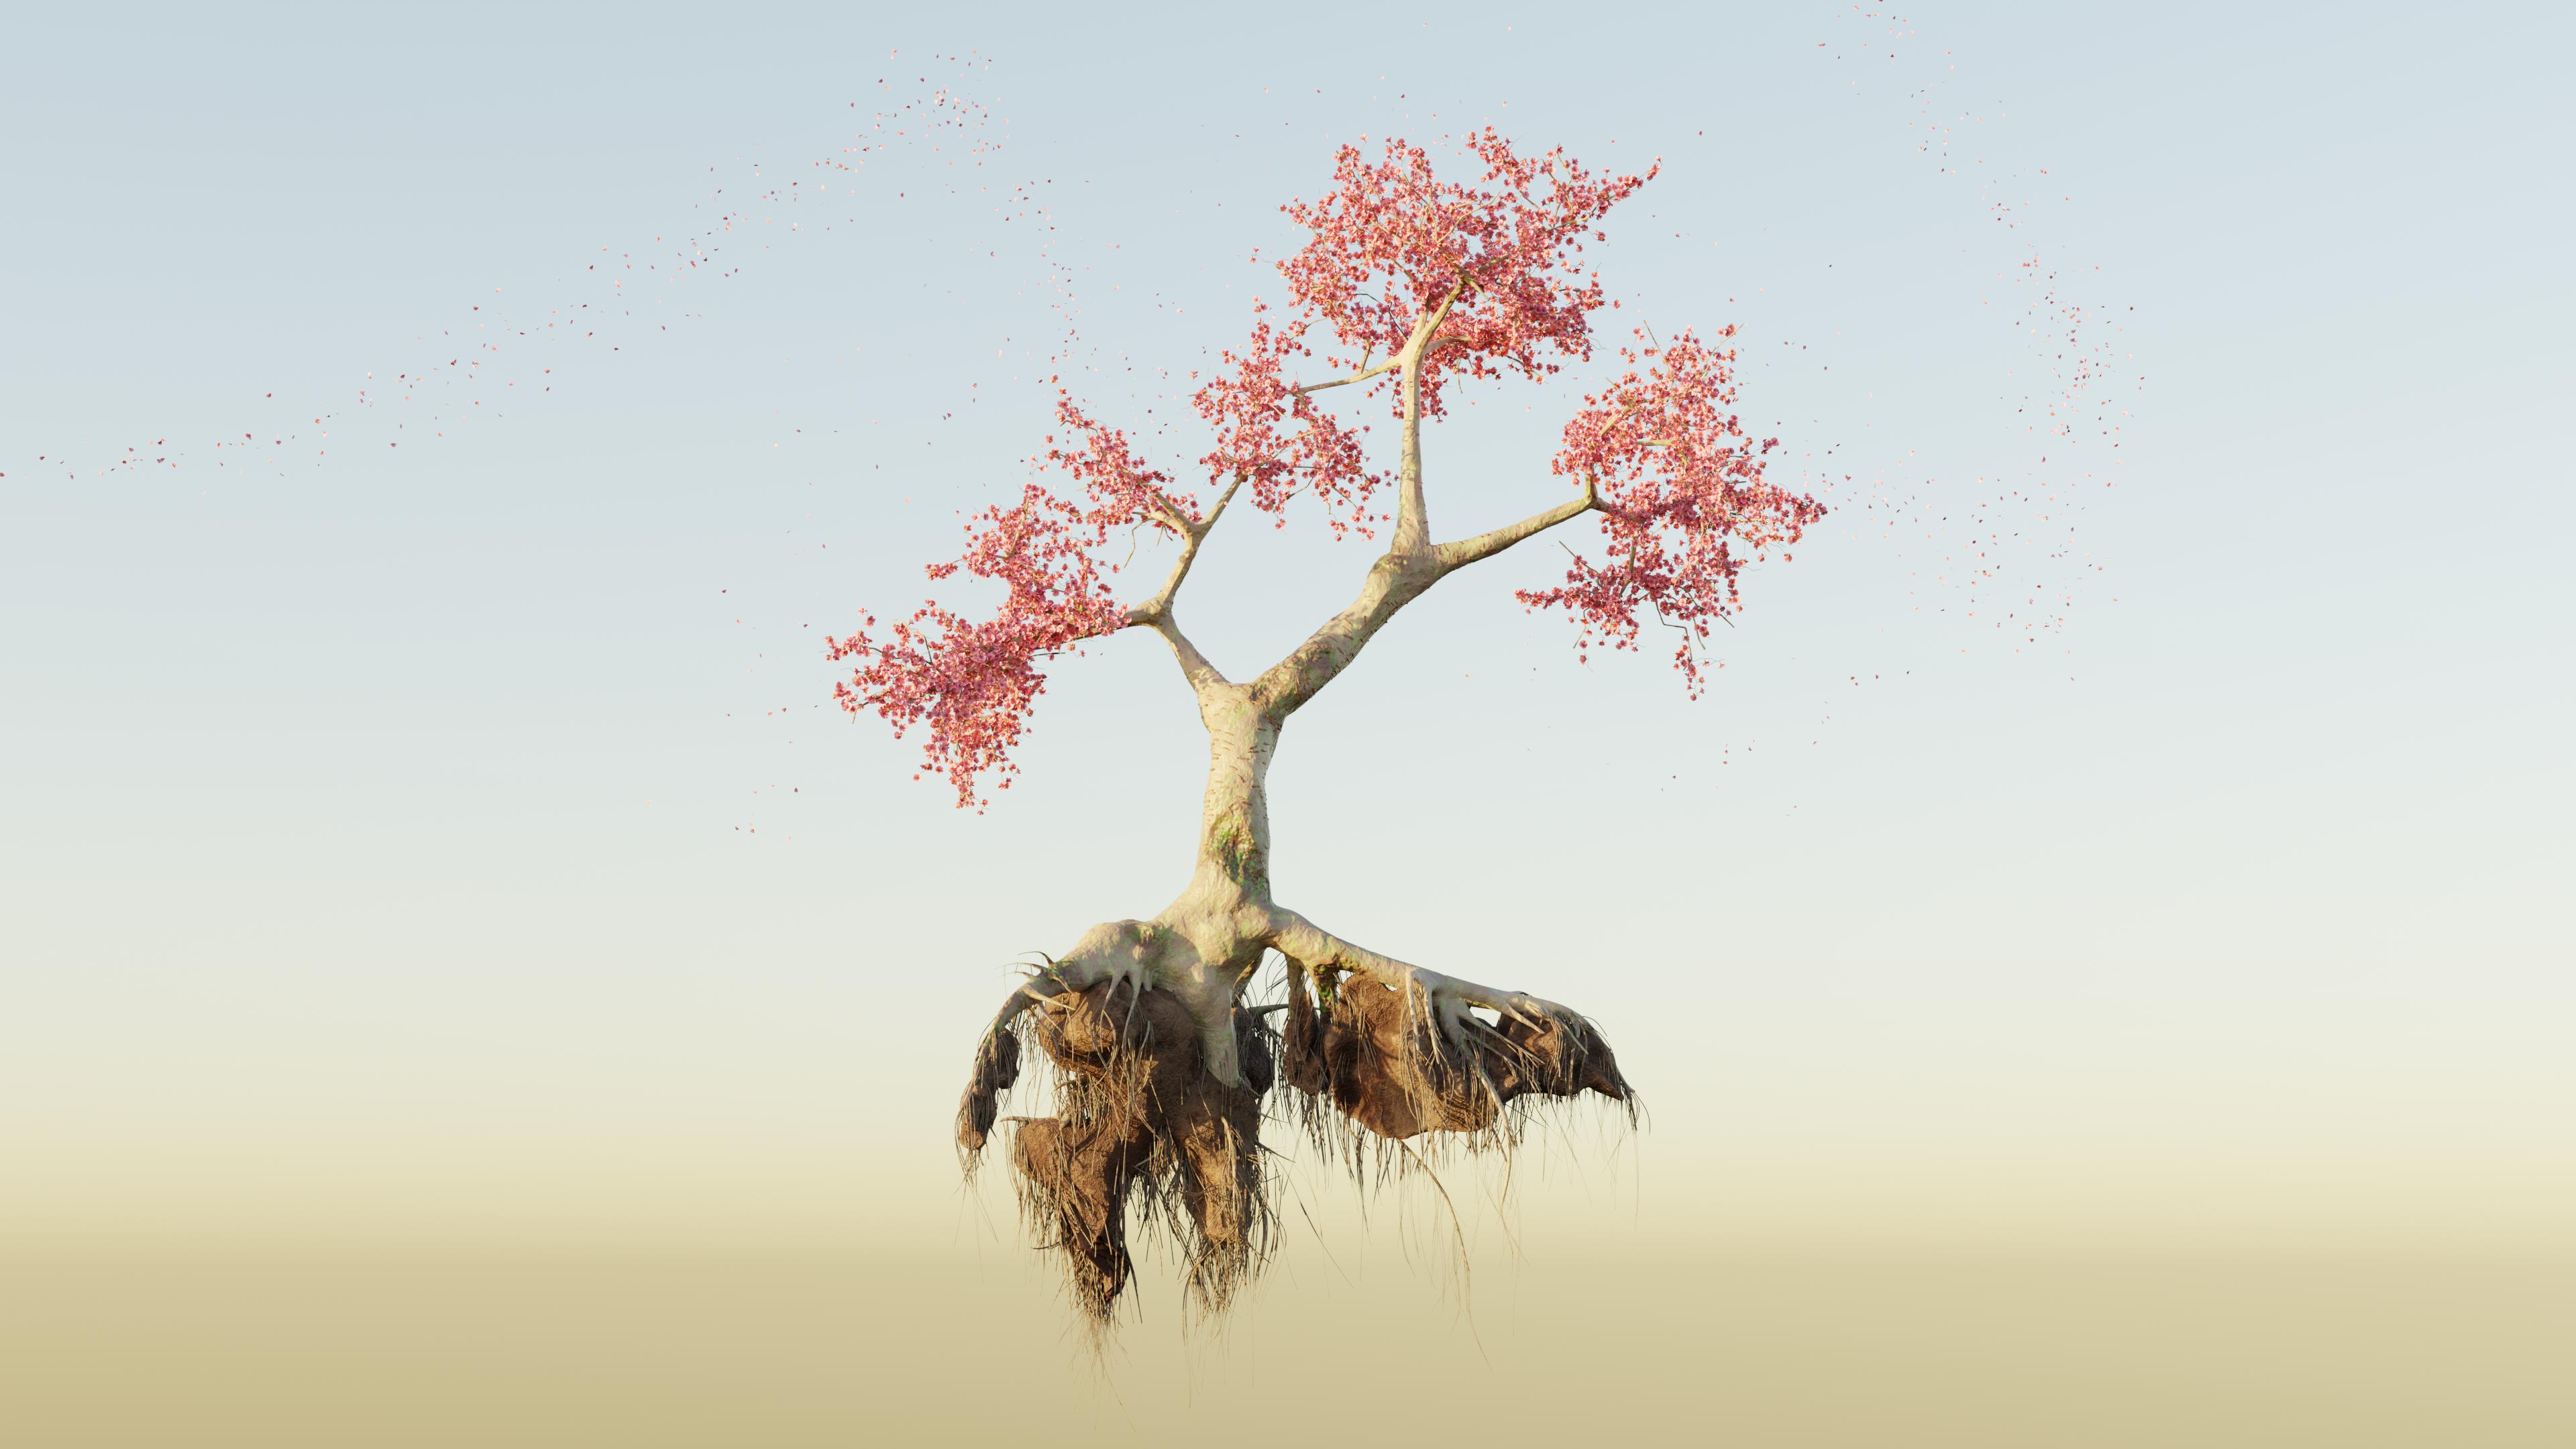 General 3840x2160 Blender 3D graphics 3D tree trunk floating cherry blossom sakura (tree)